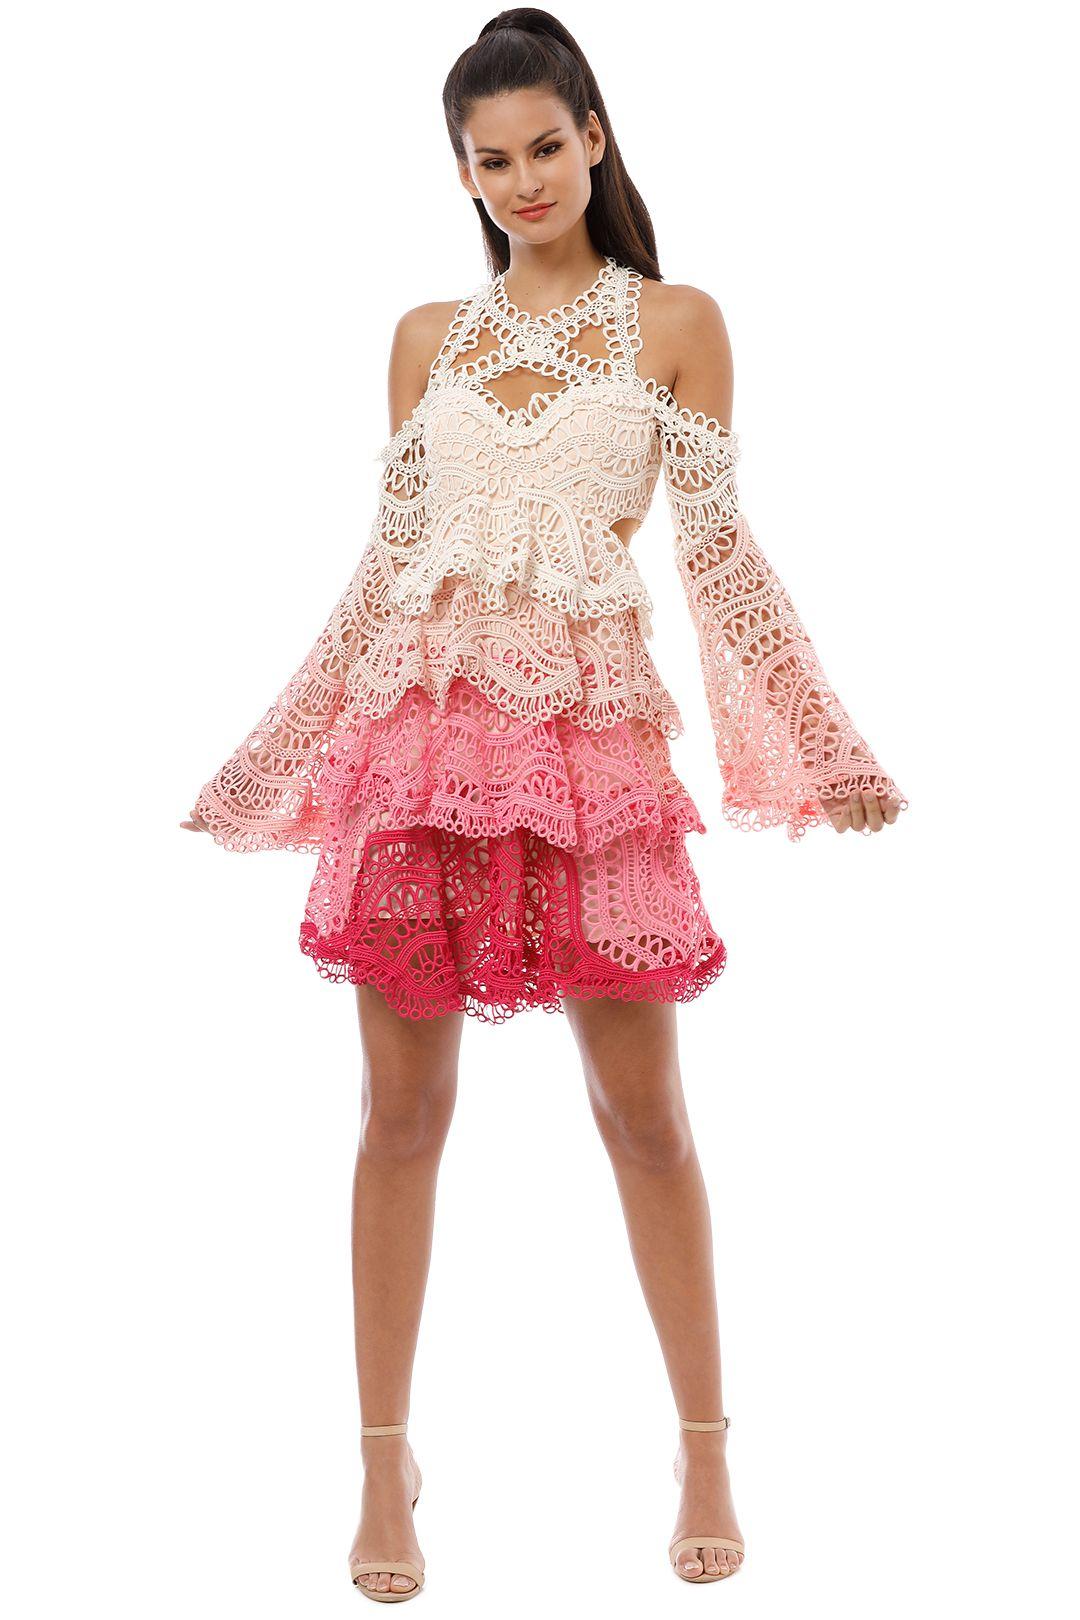 Thurley - Rainbow Mini Dress - Pink - Front